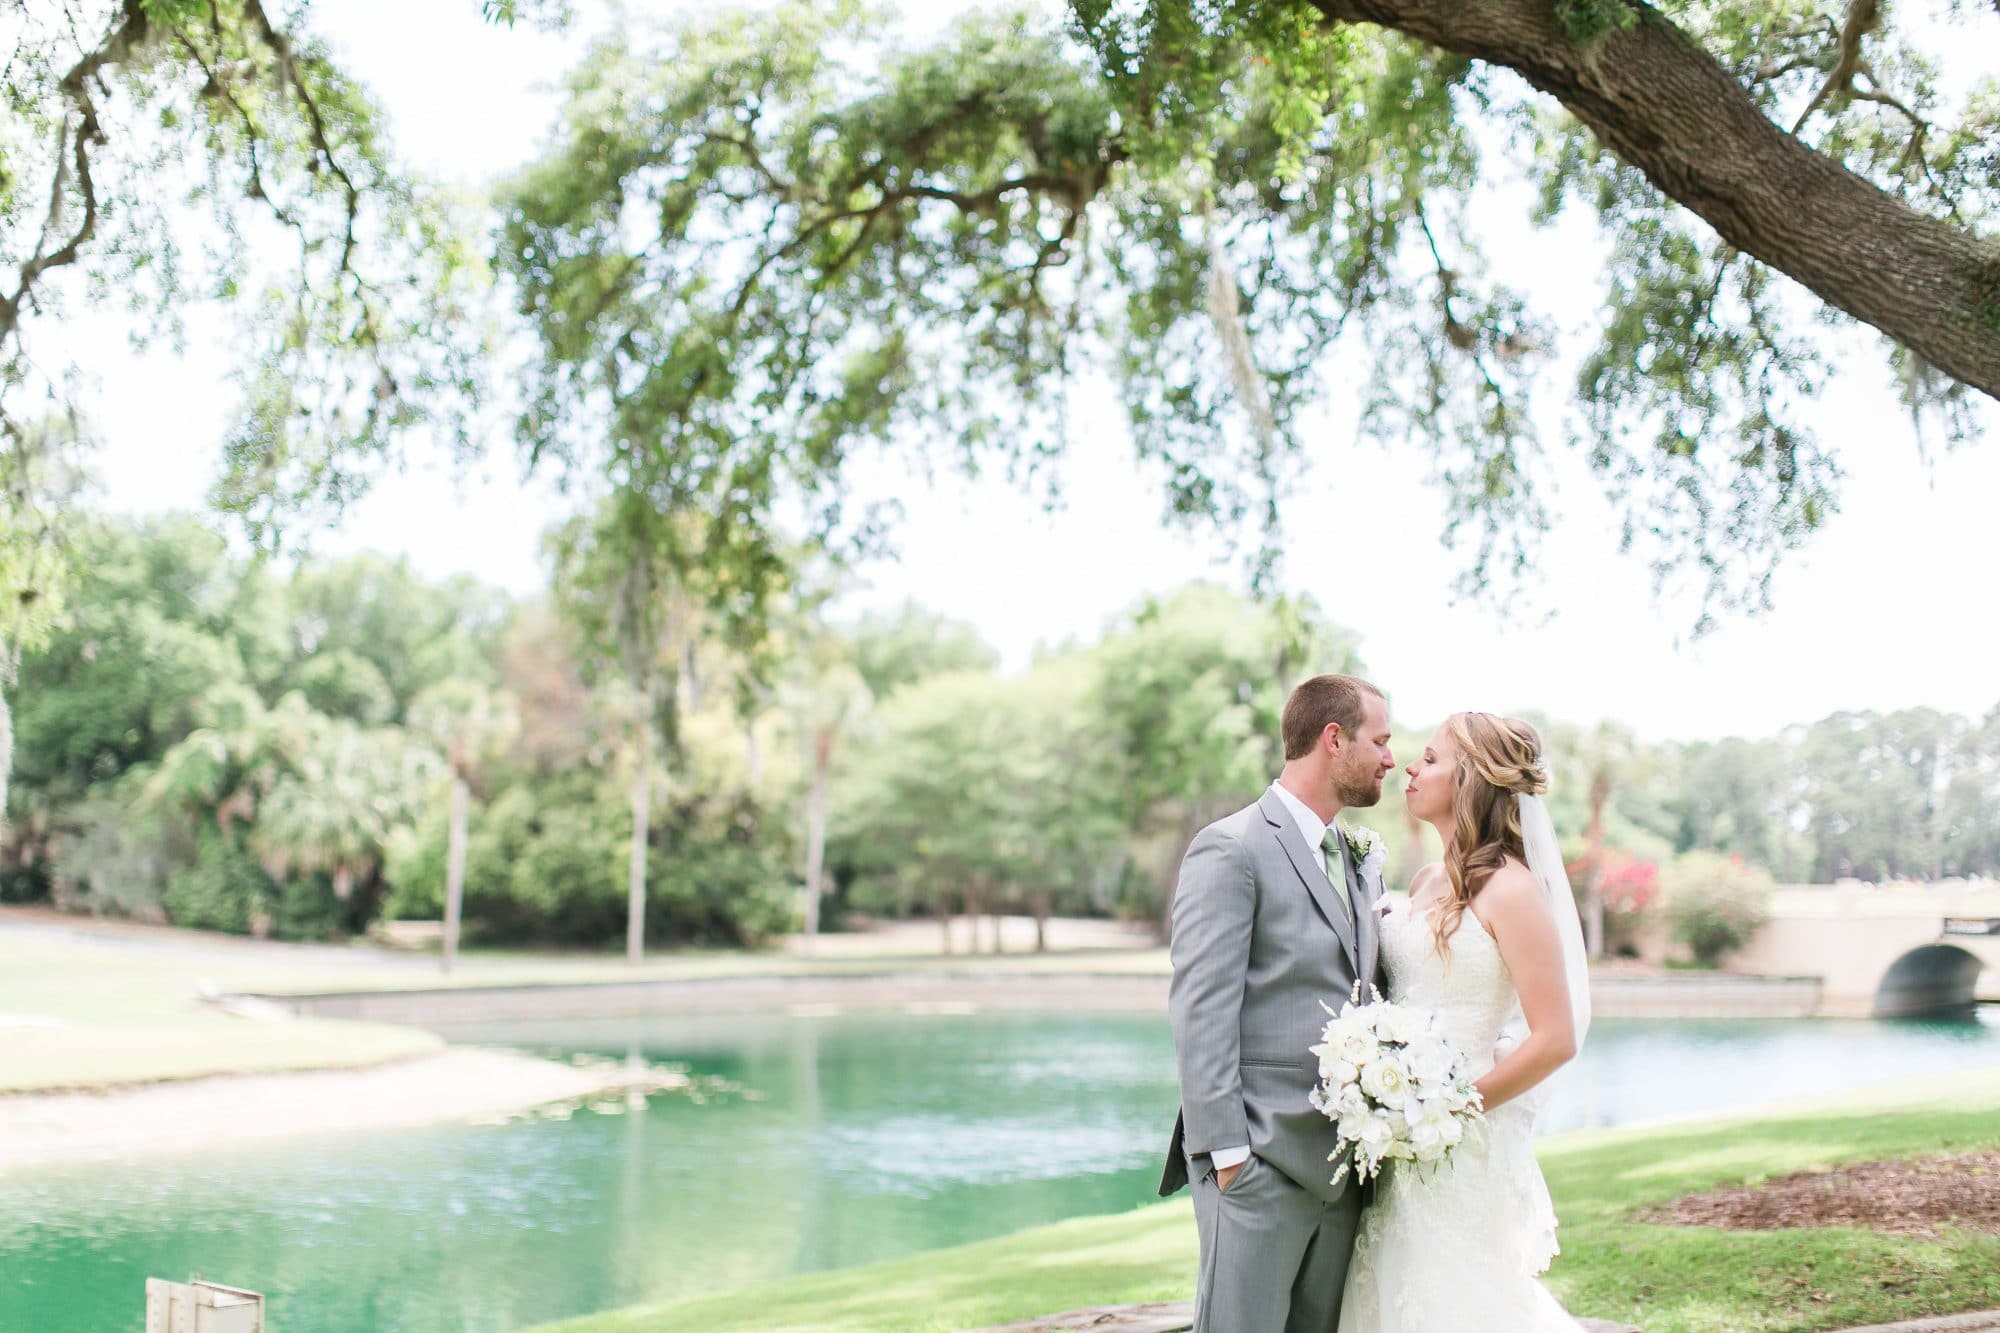 Mission Inn - bride and groom under oak tree